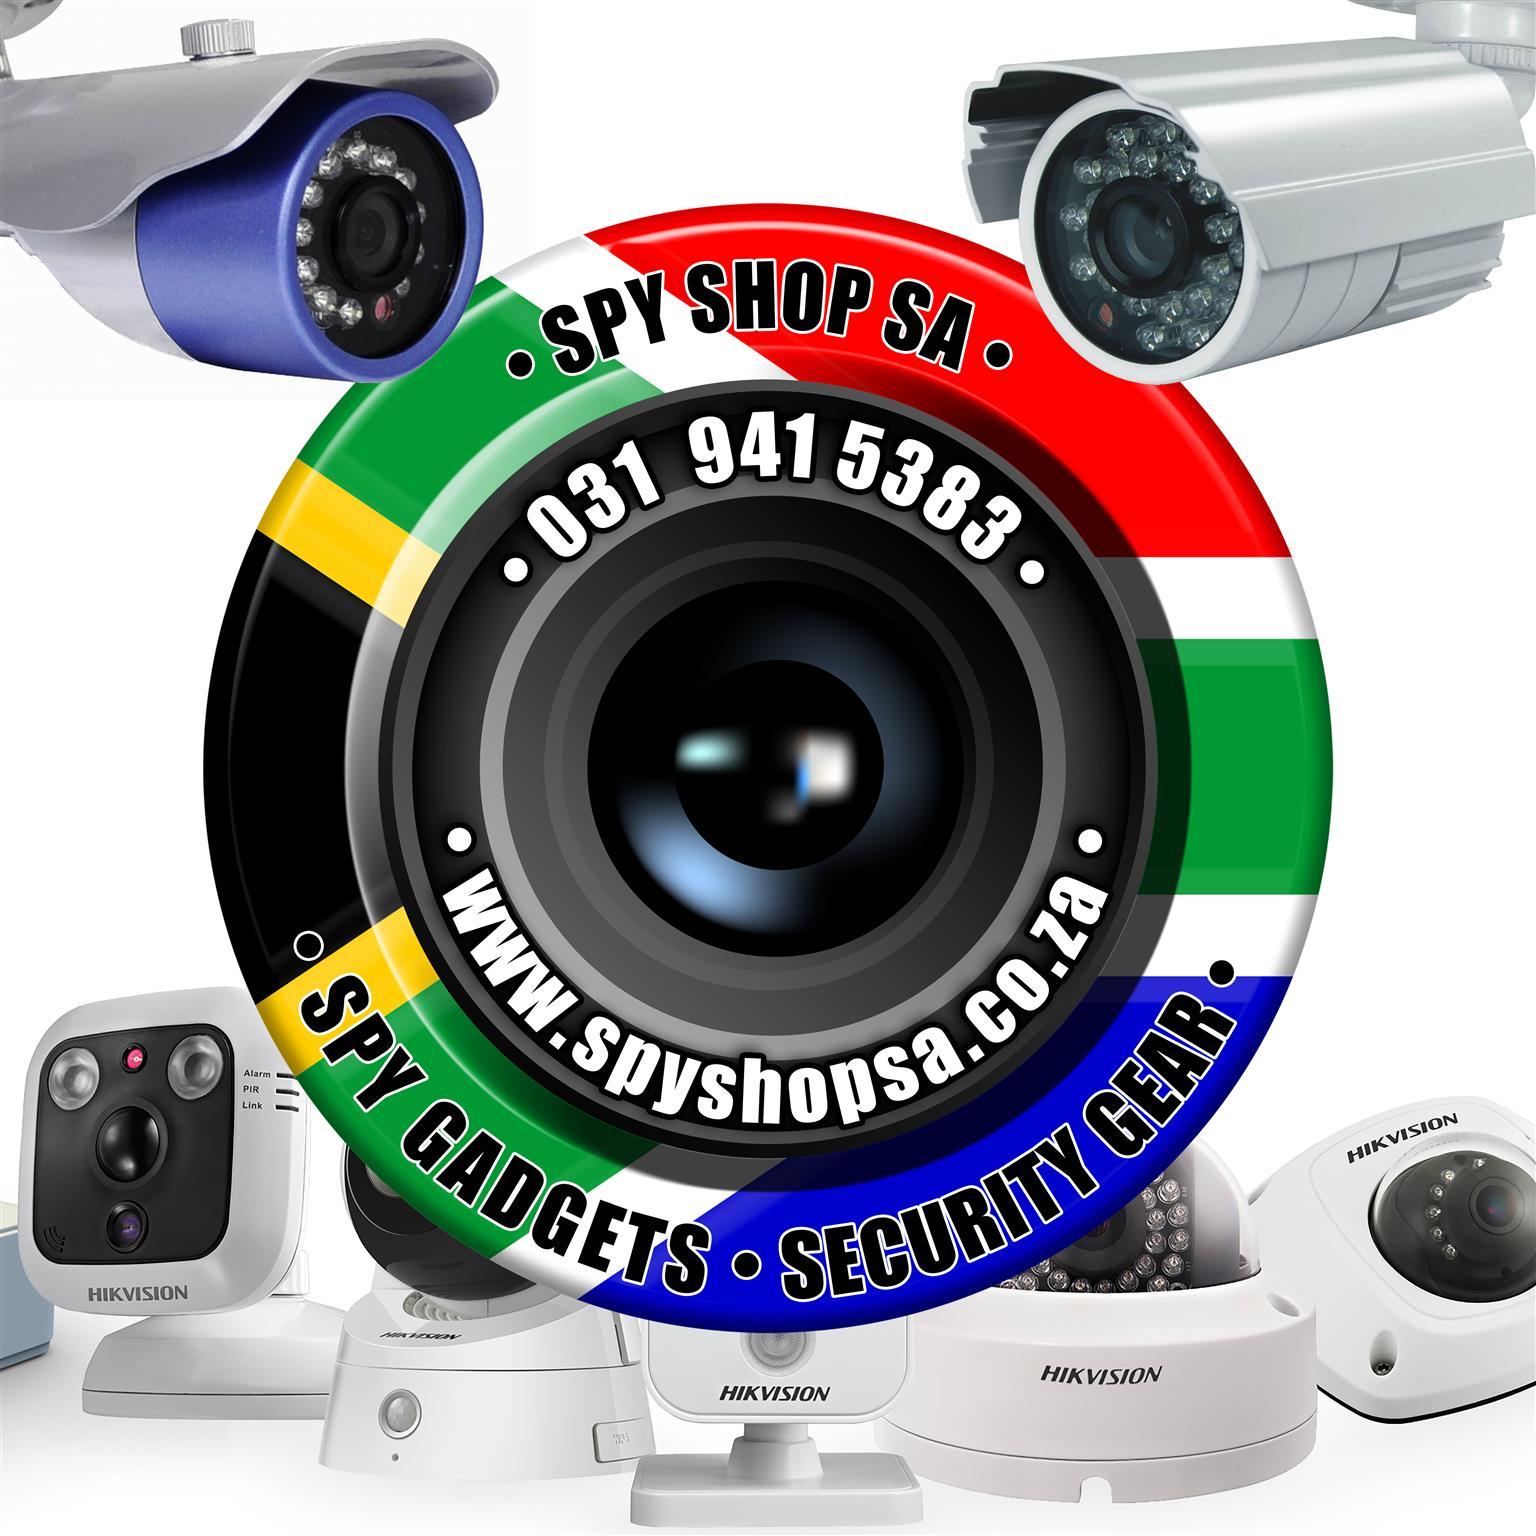 Mini Screw CCTV Camera - Black Friday 2019